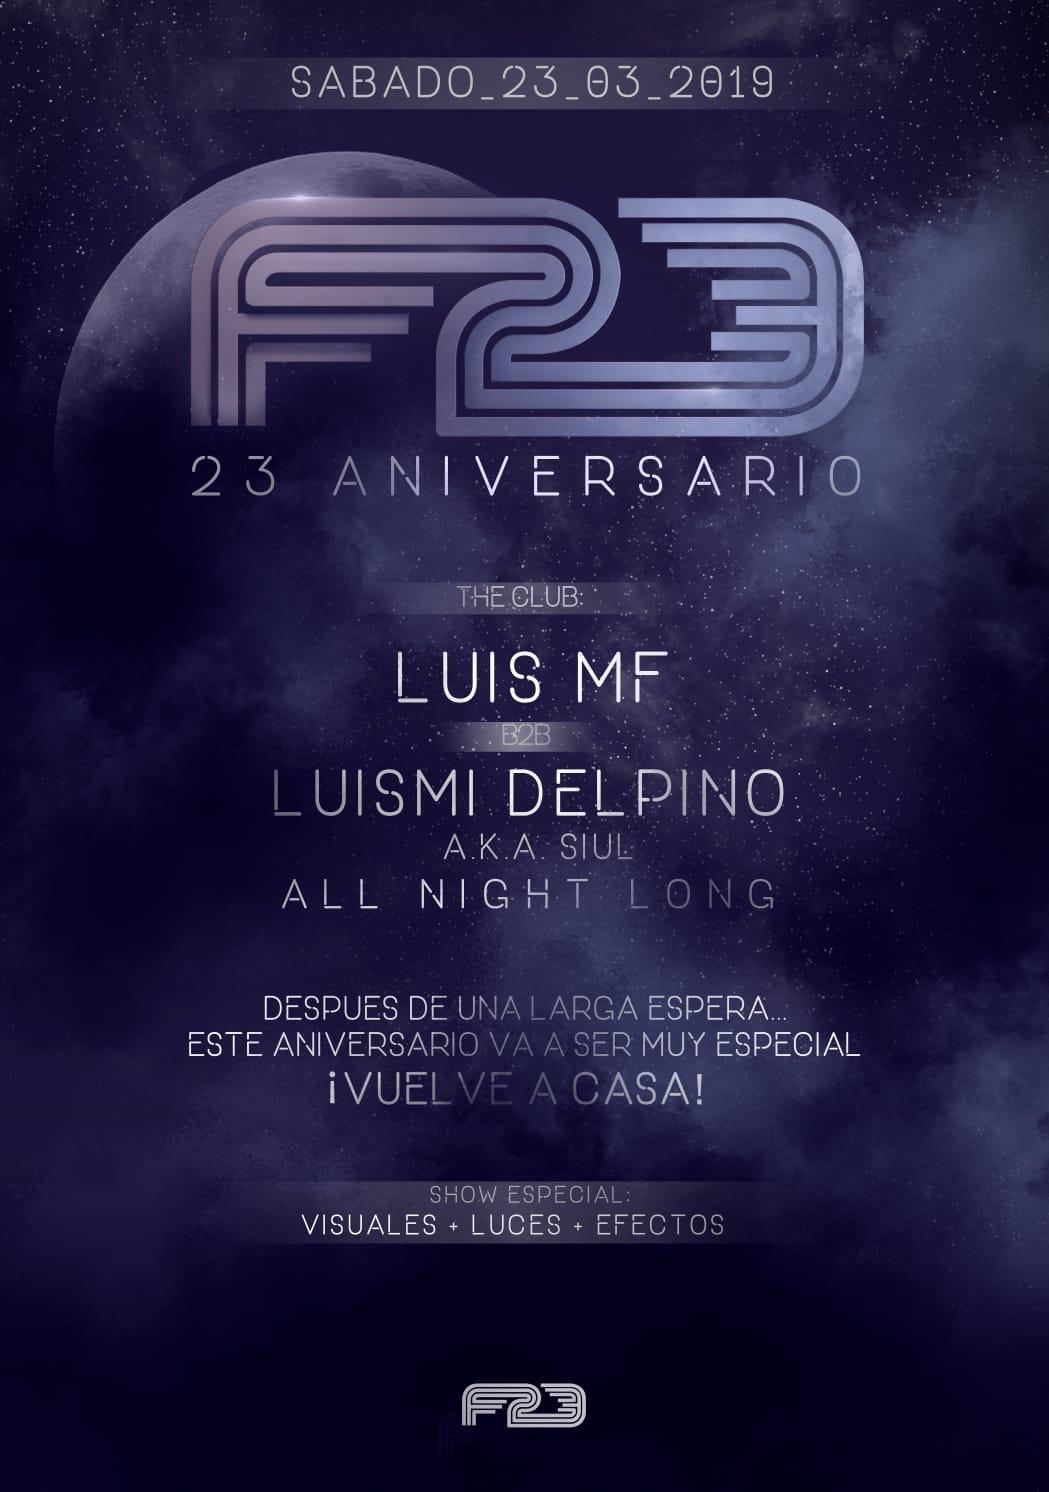 23-aniversario-family-club-5c5d633b737a4